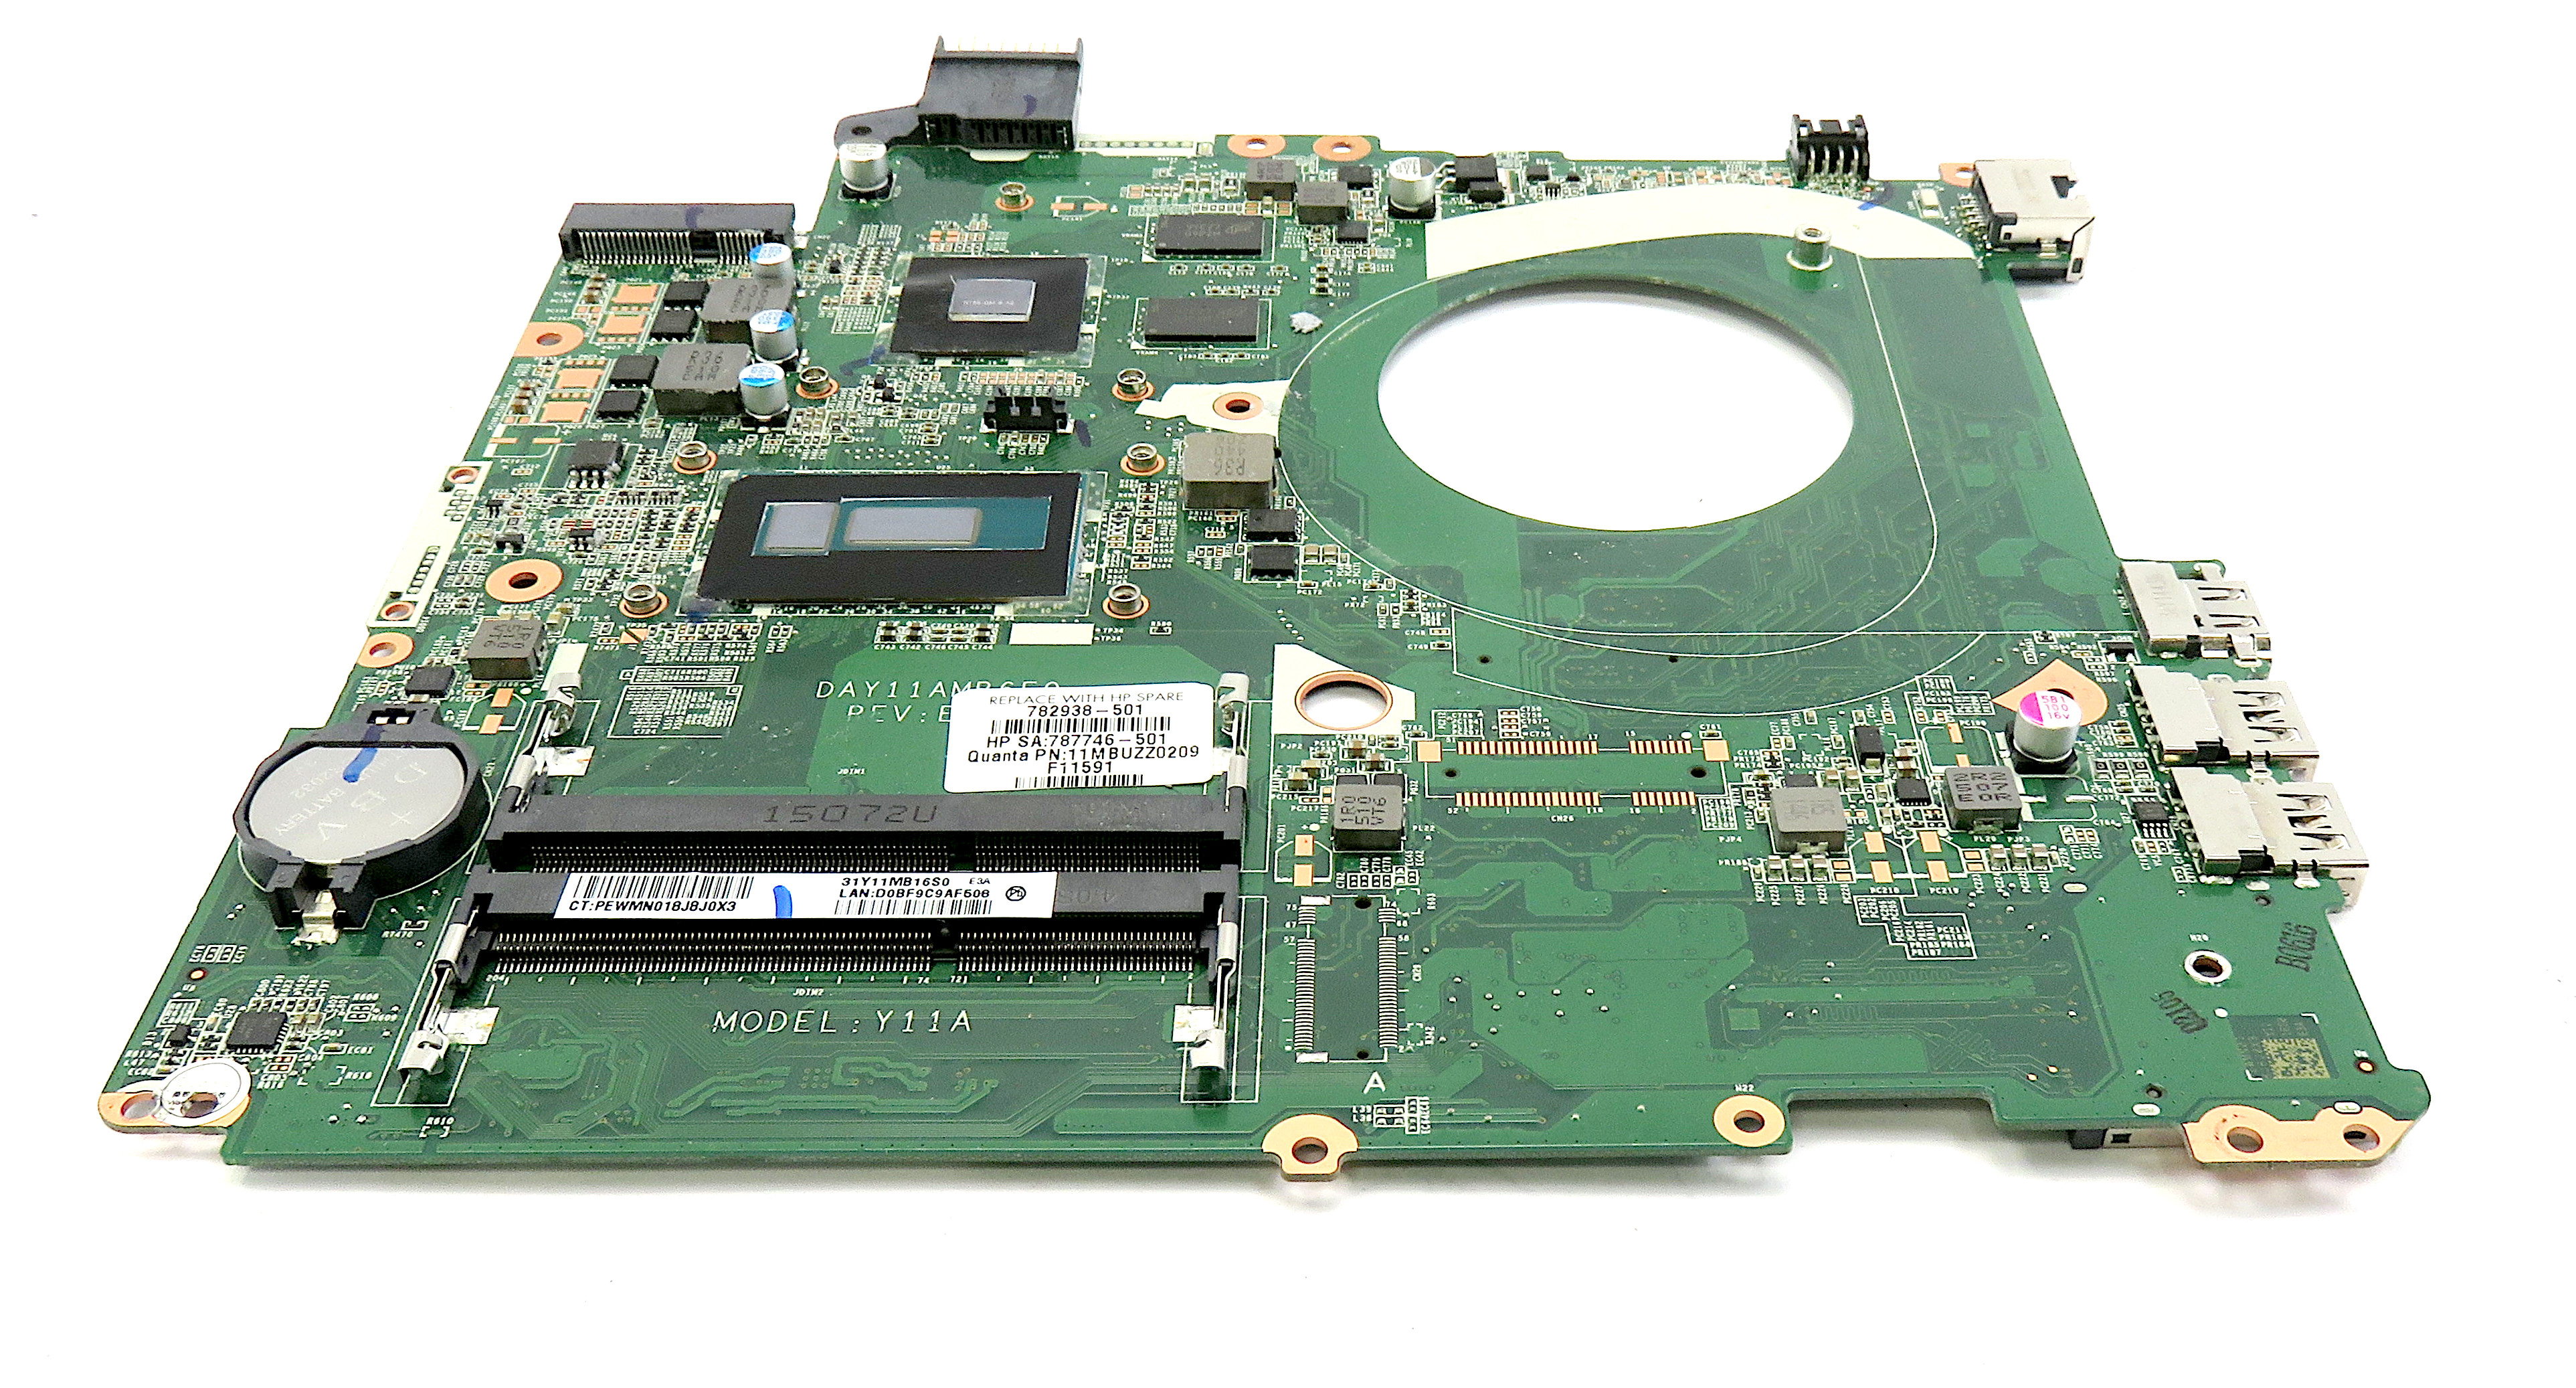 HP Pavilion 15-P 782938-501 Motherboard w/ i5-5200u & GeForce 830M GPU